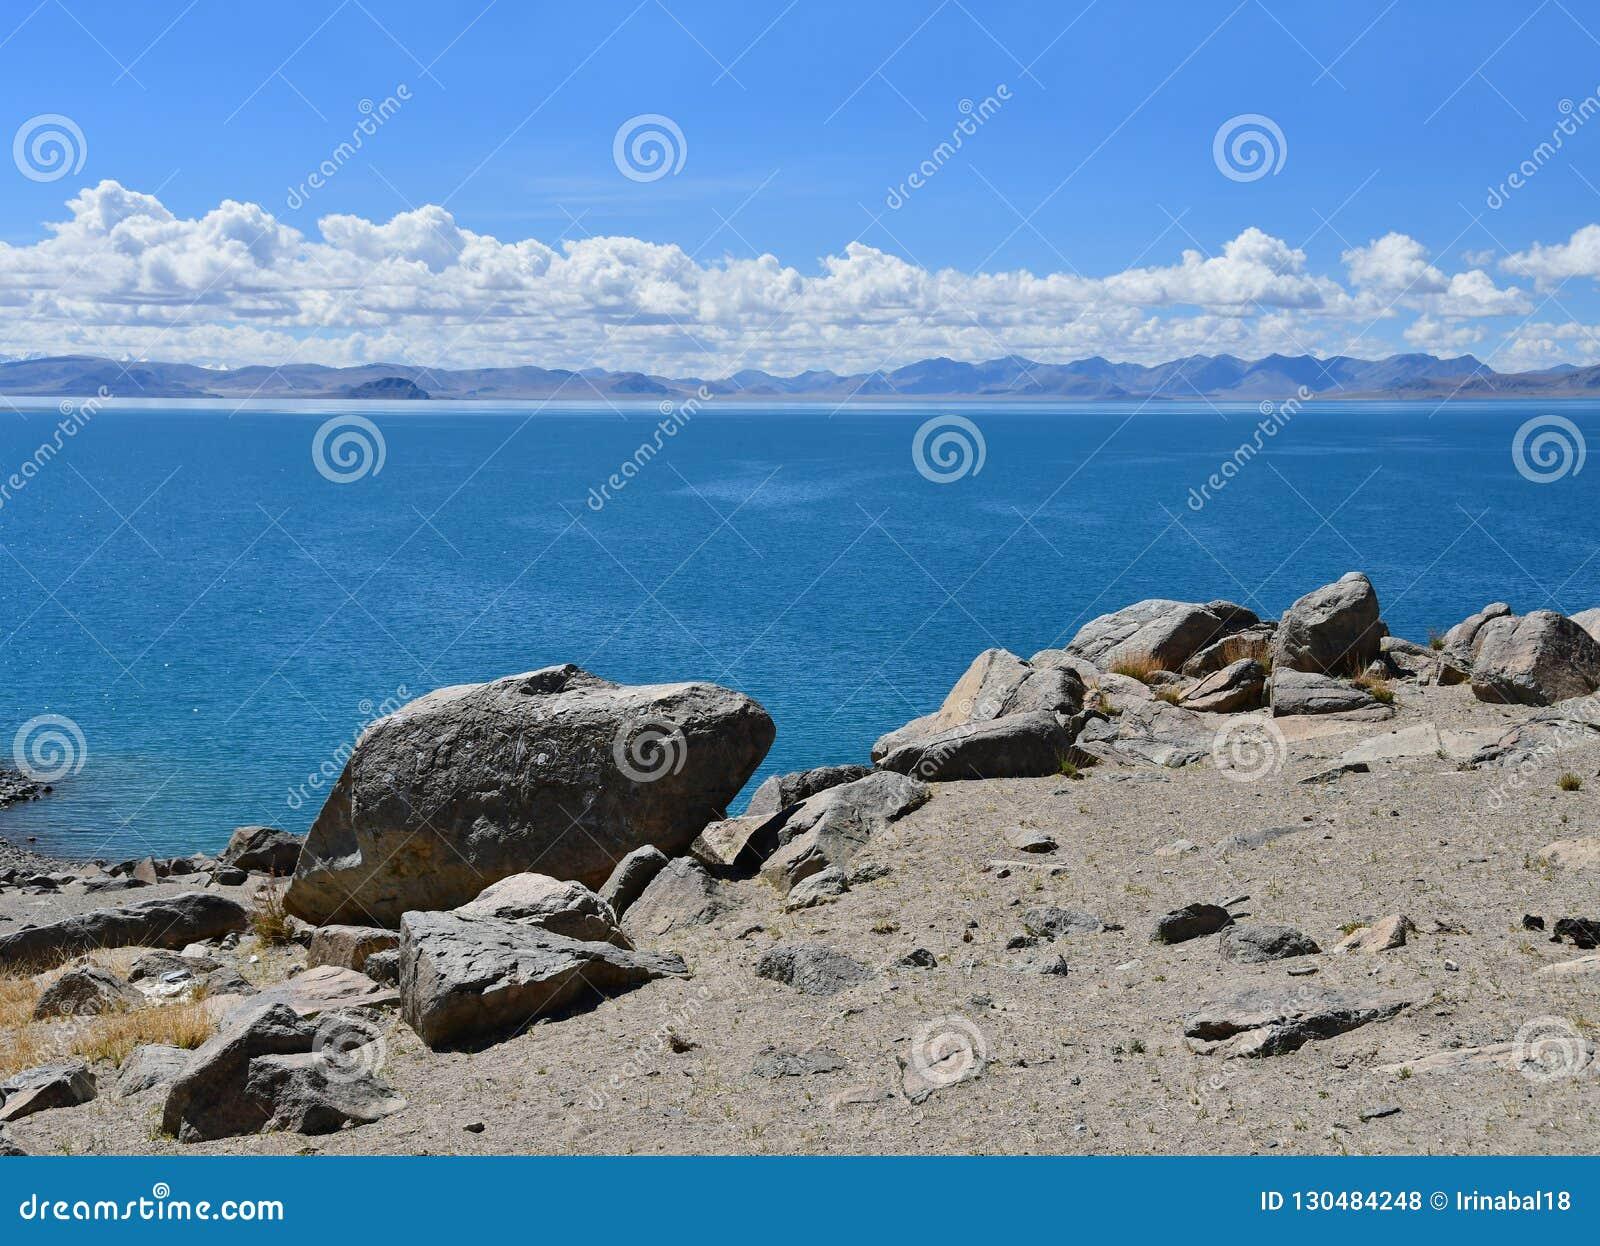 Kina Great Lakes av Tibet Sjö Teri Tashi Namtso i solig sommardag